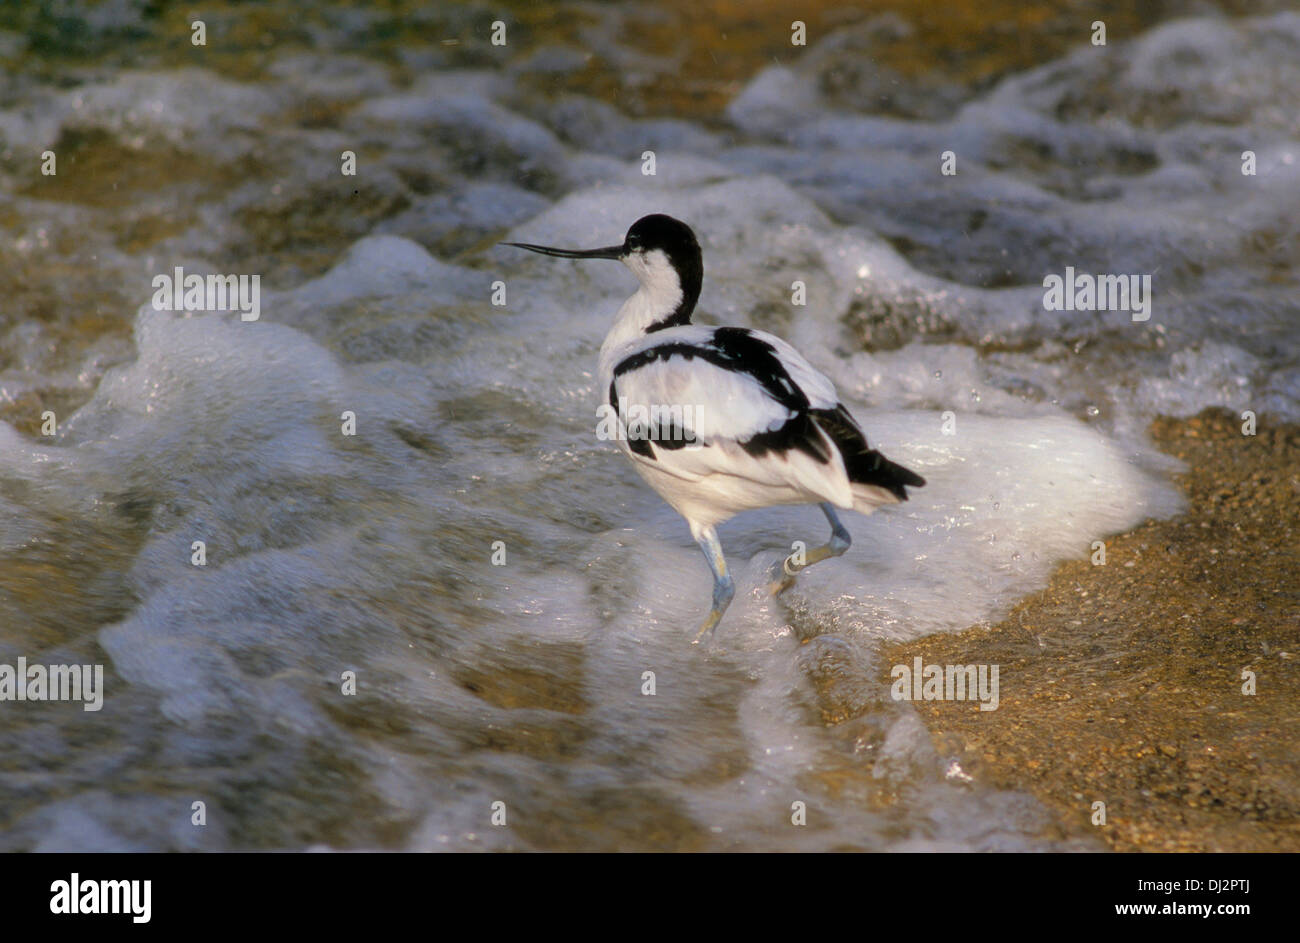 Pied Avocet, Recurvirostra avosetta, Black-capped Avocet, Eurasian Avocet, Säbelschnäbler (Recurvirostra avosetta) - Stock Image